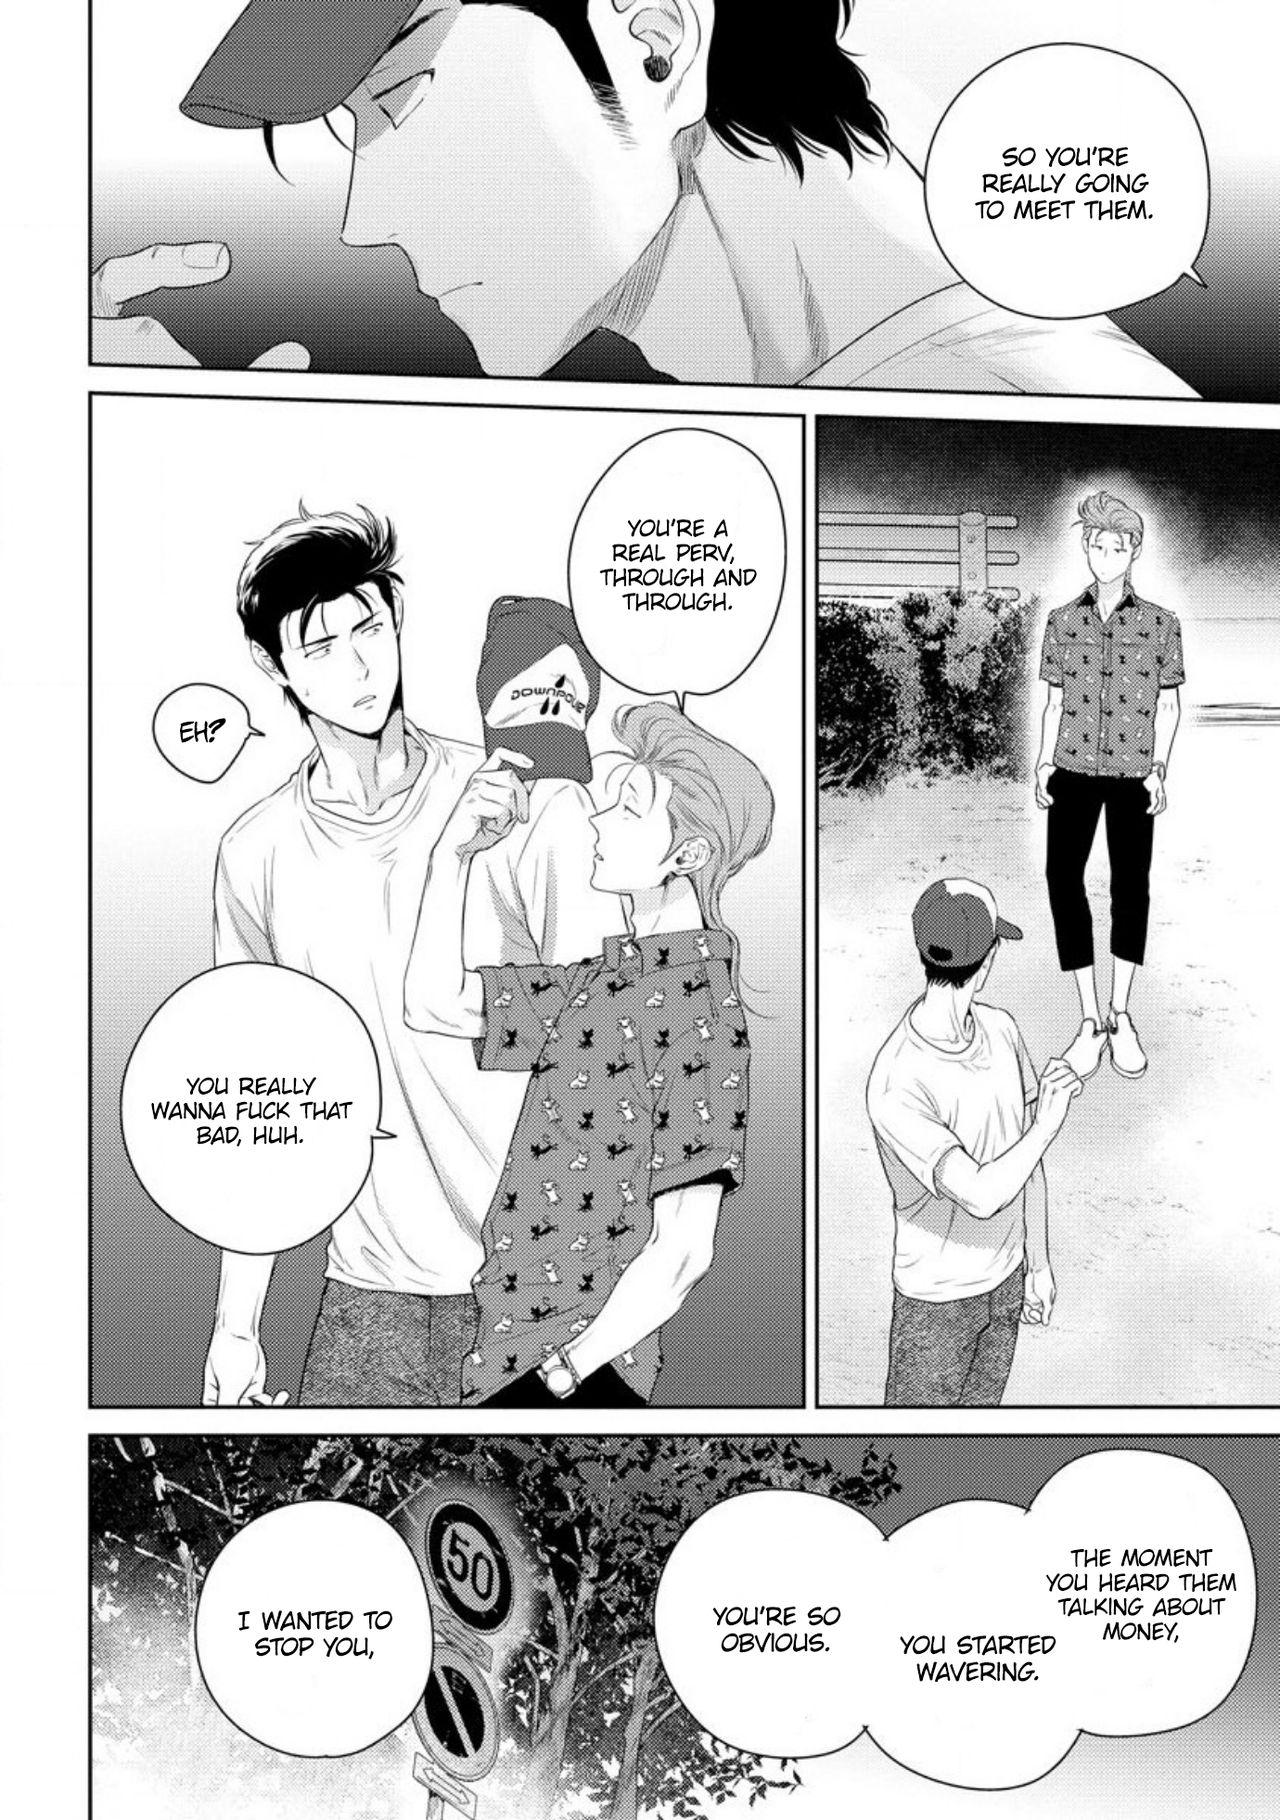 [Hiiragi Nozomu] Nakasete Yaru yo Yankee-kun   I'll Make You Cry Ch. 1-5 + Extras [English] [Digital] 112